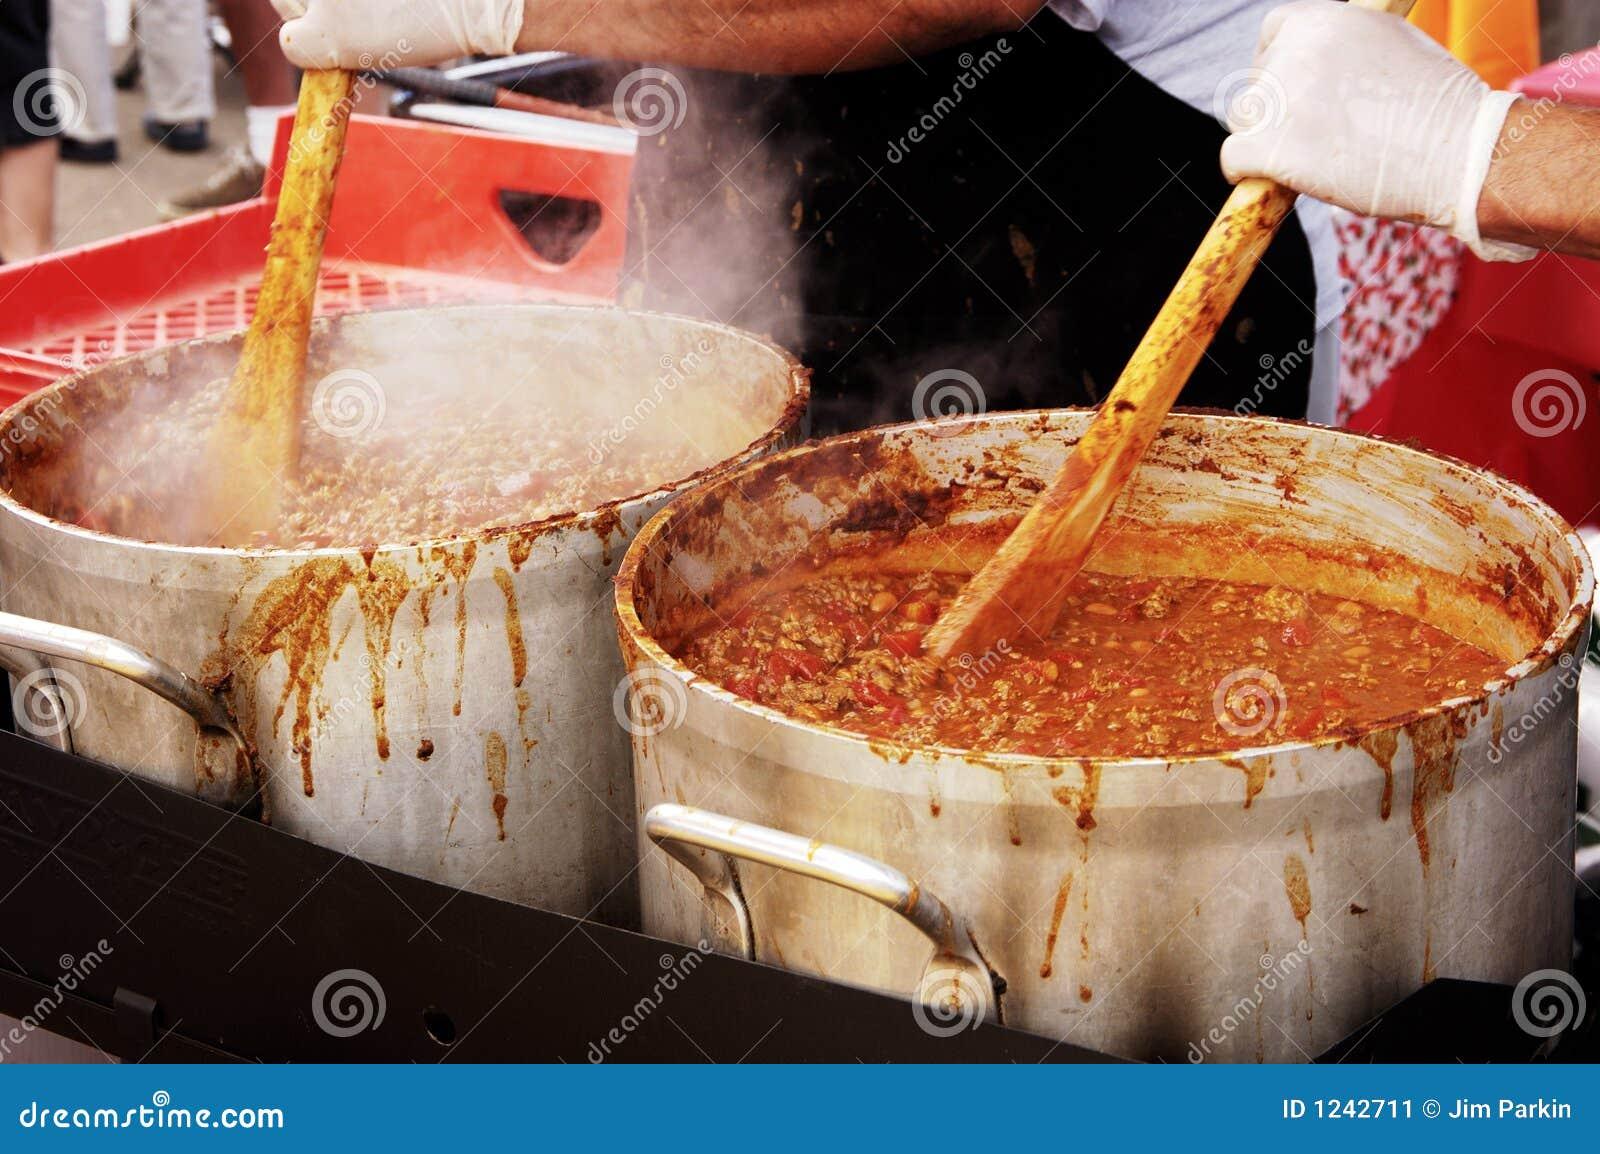 Chili 1 cook.